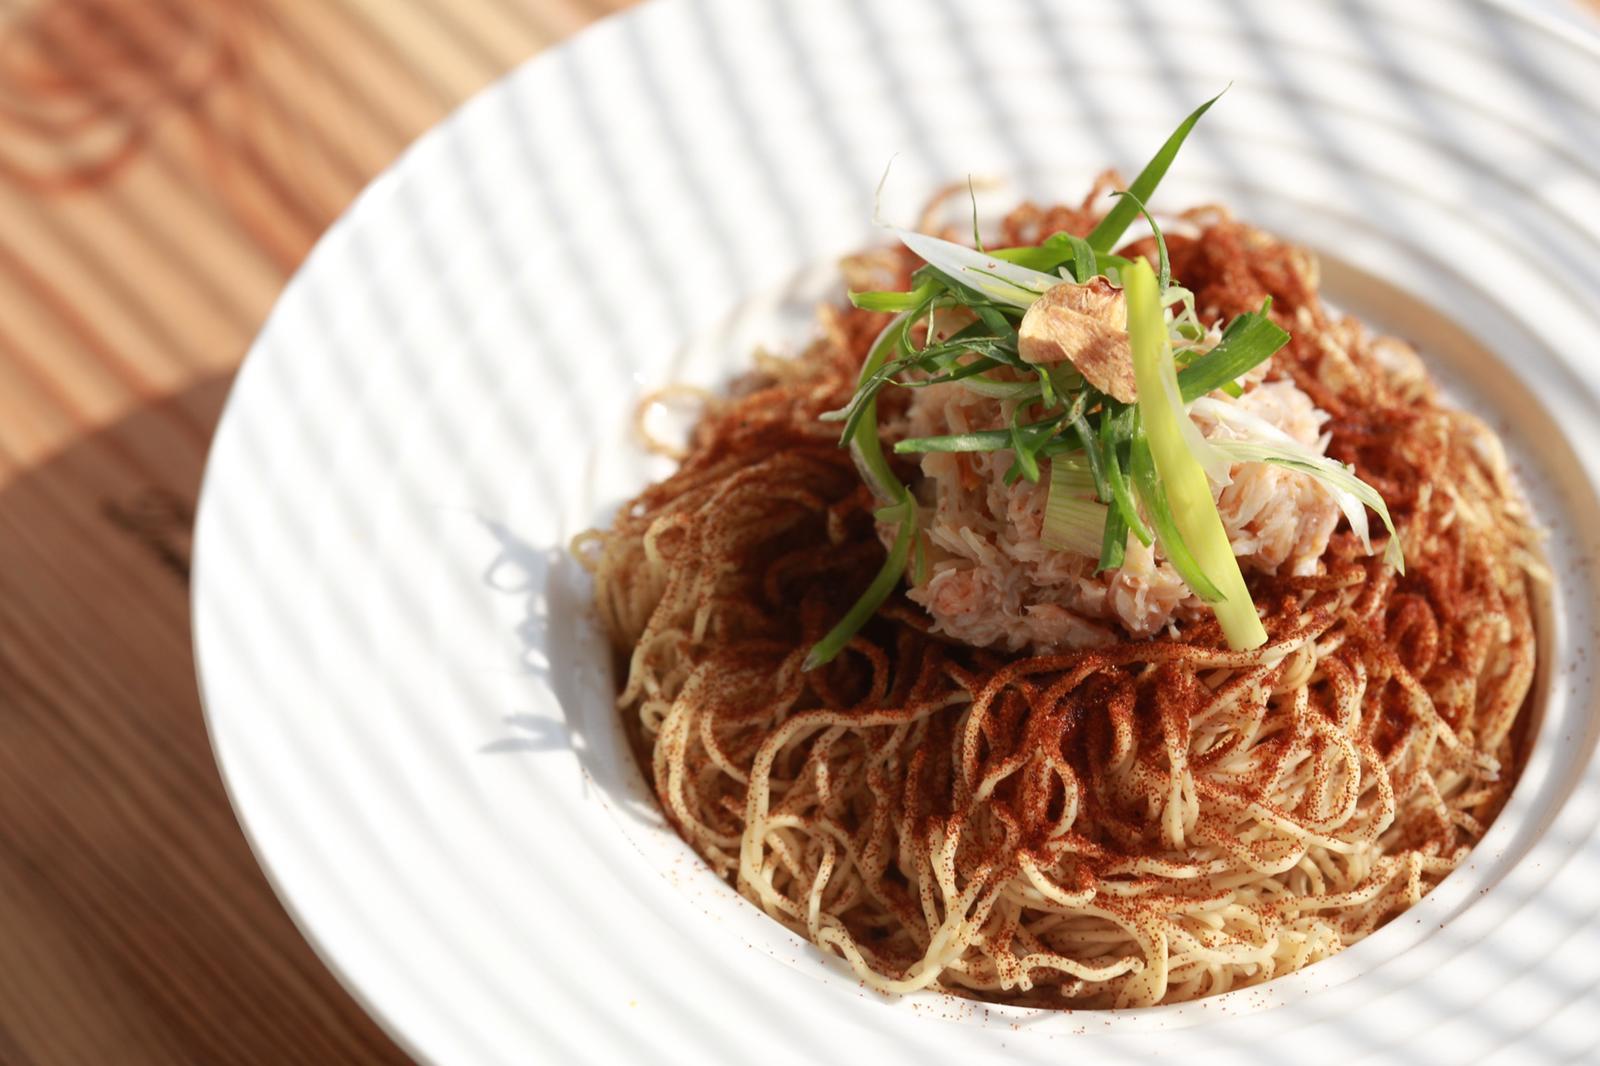 觀塘 Master Room Cafe One Little Room 食物 蝦子蟹肉乾撈蝦子麵